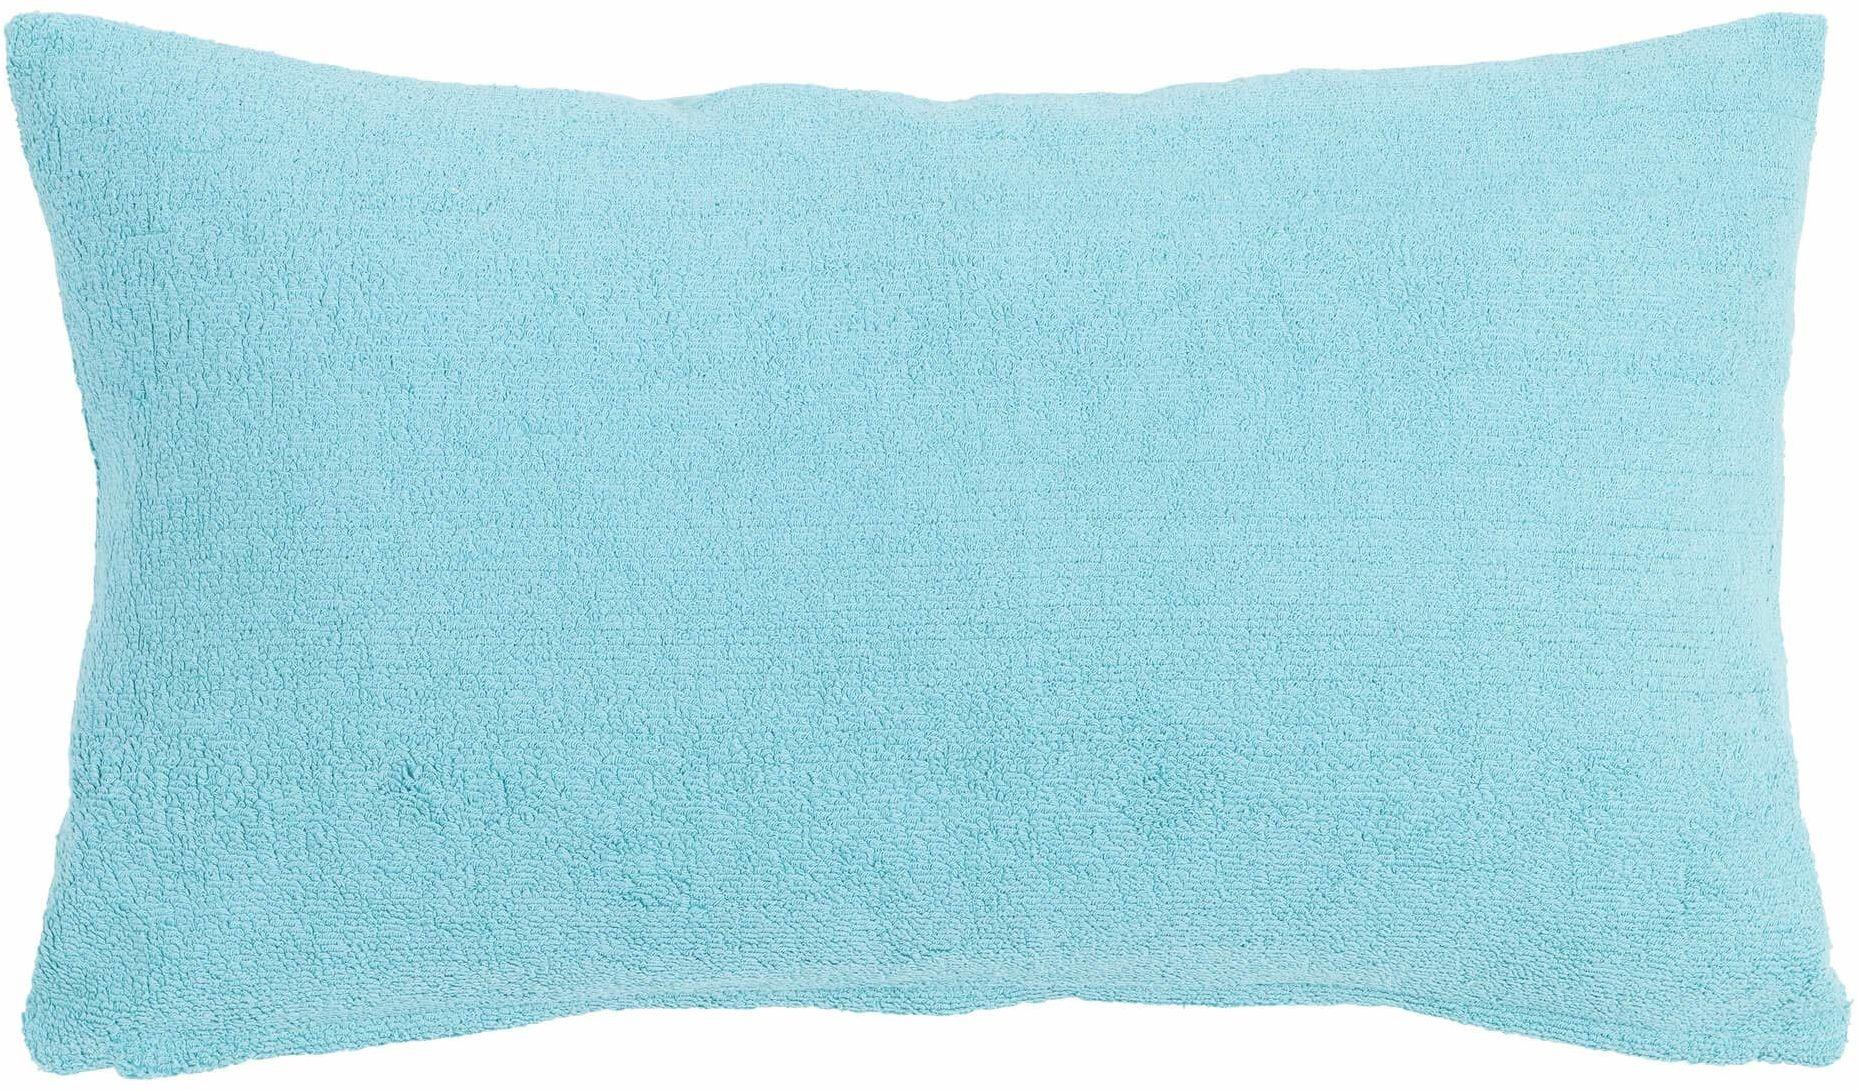 Linen & More poduszka dekoracyjna, bawełna, turkusowa, 30 x 50 cm